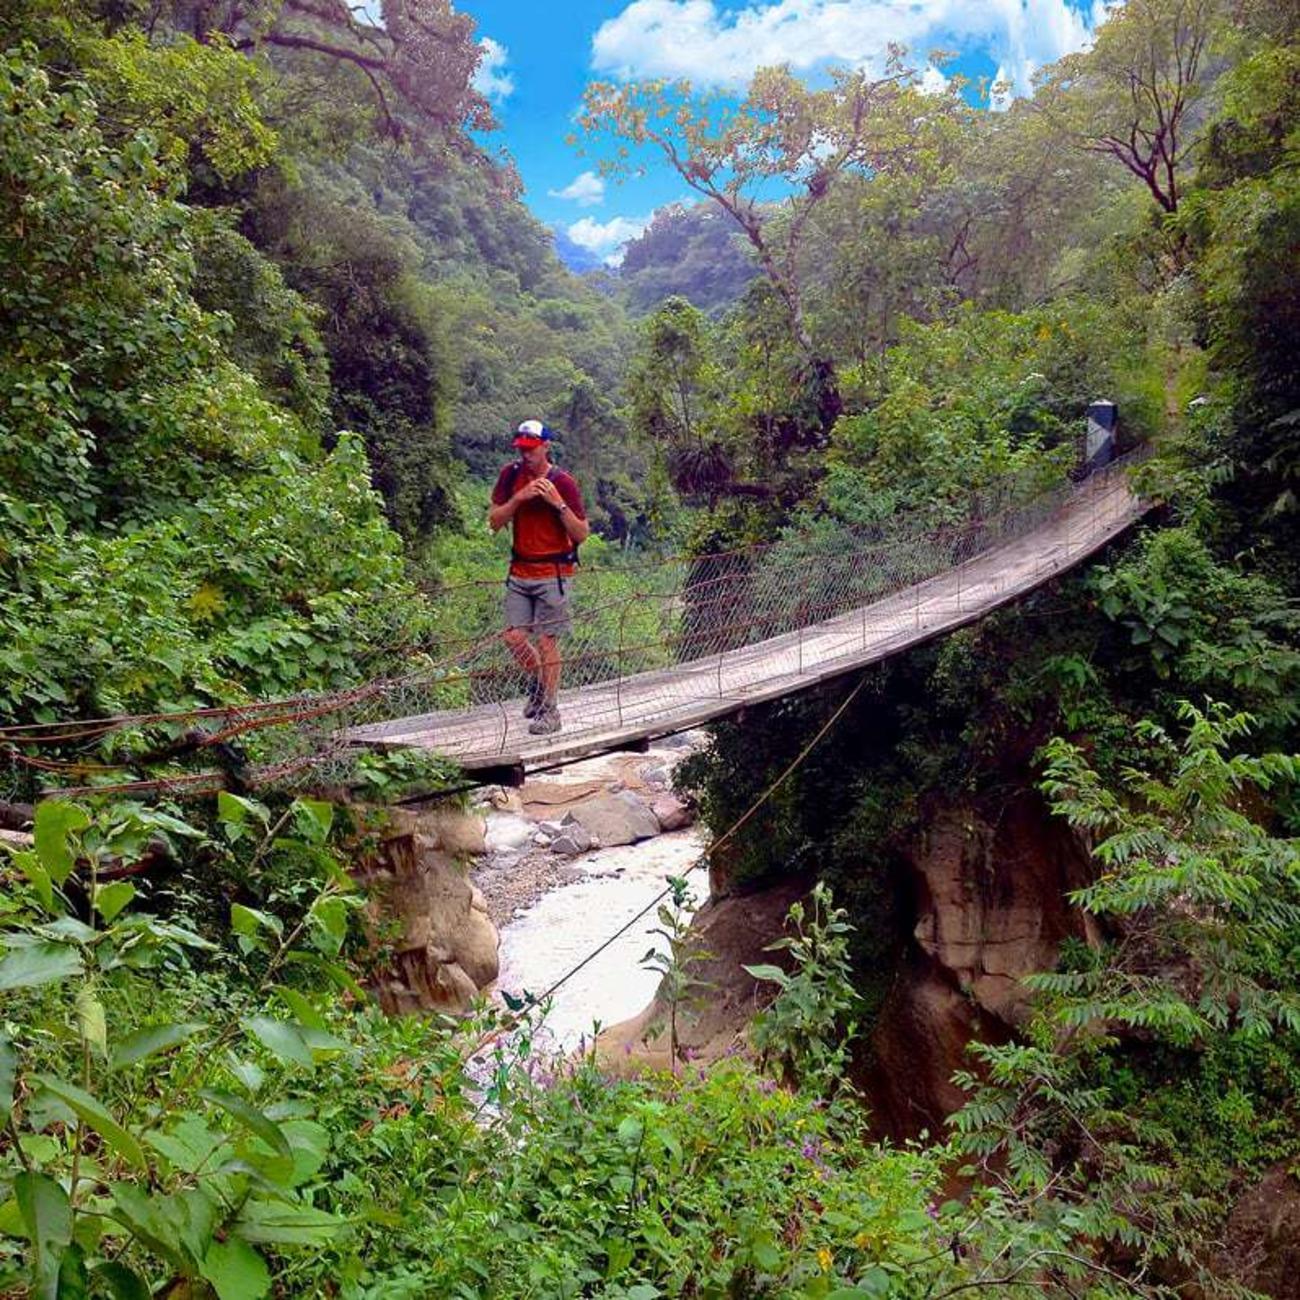 guatemala hiking holidays